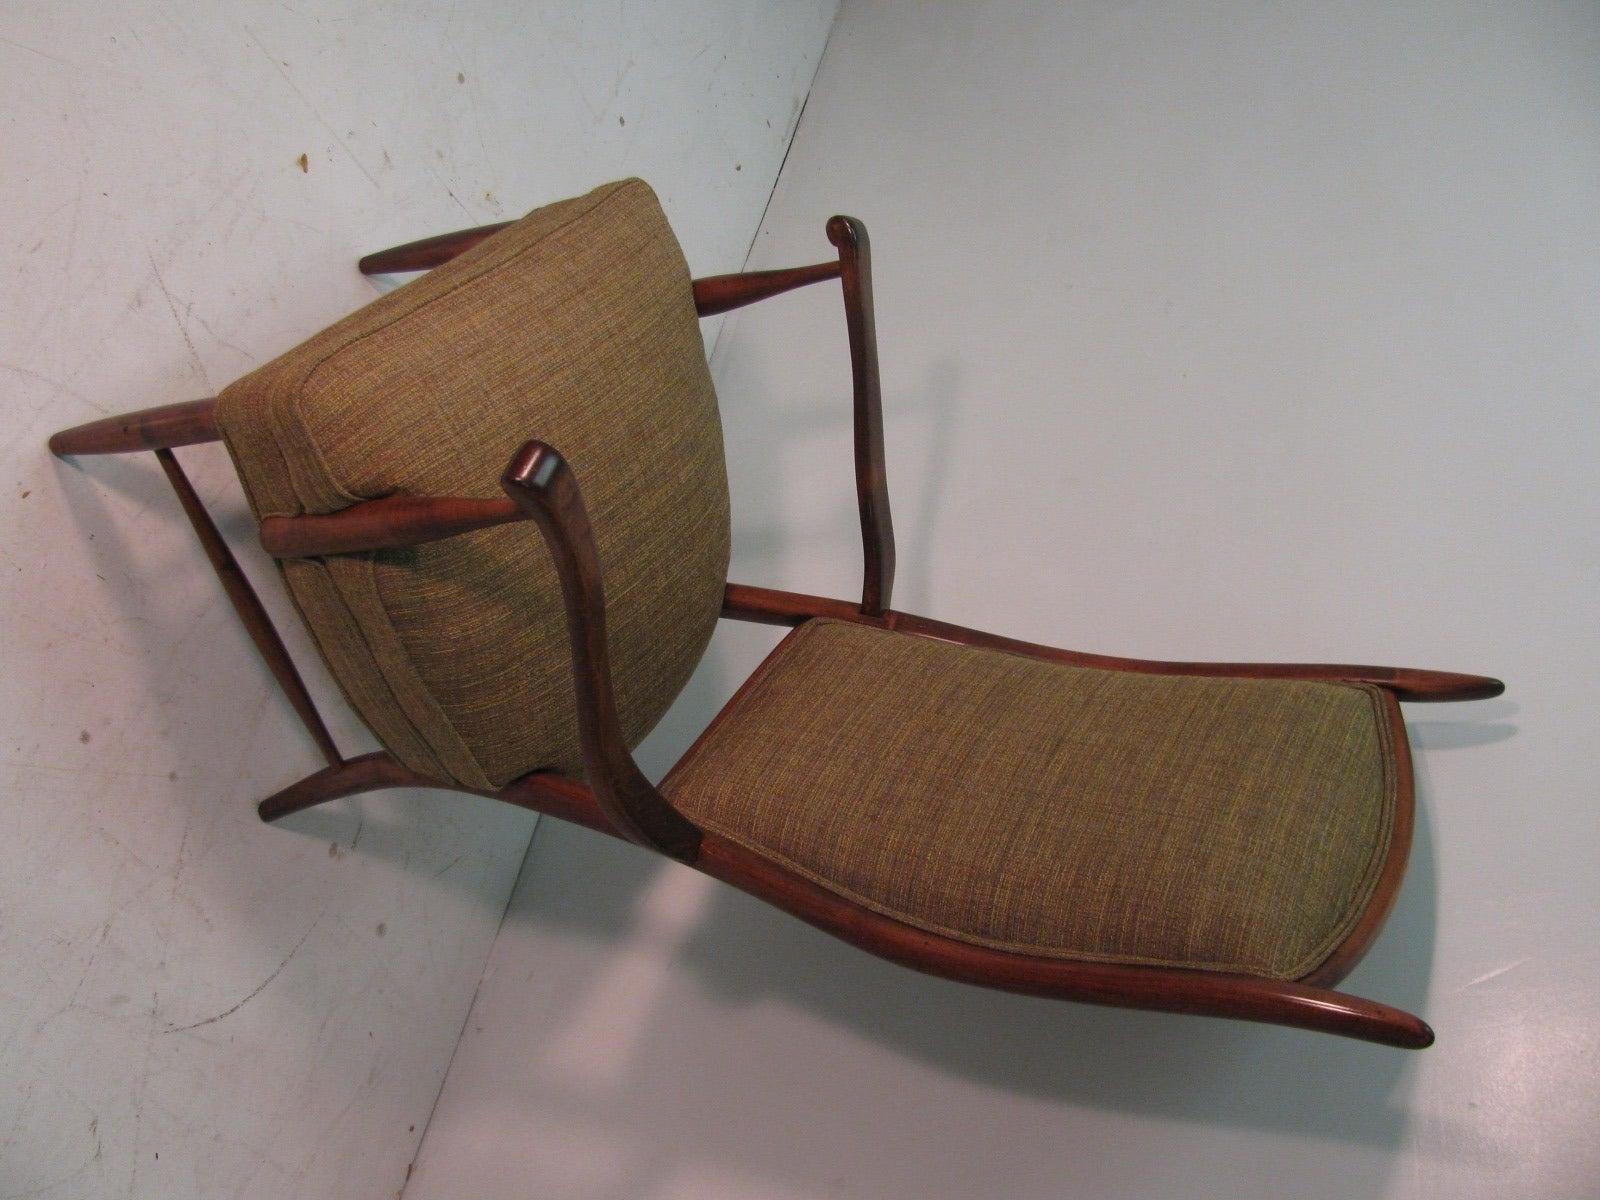 American Mid-Century Modern Curved Tallback Whimsical Armchair Edward Wormley